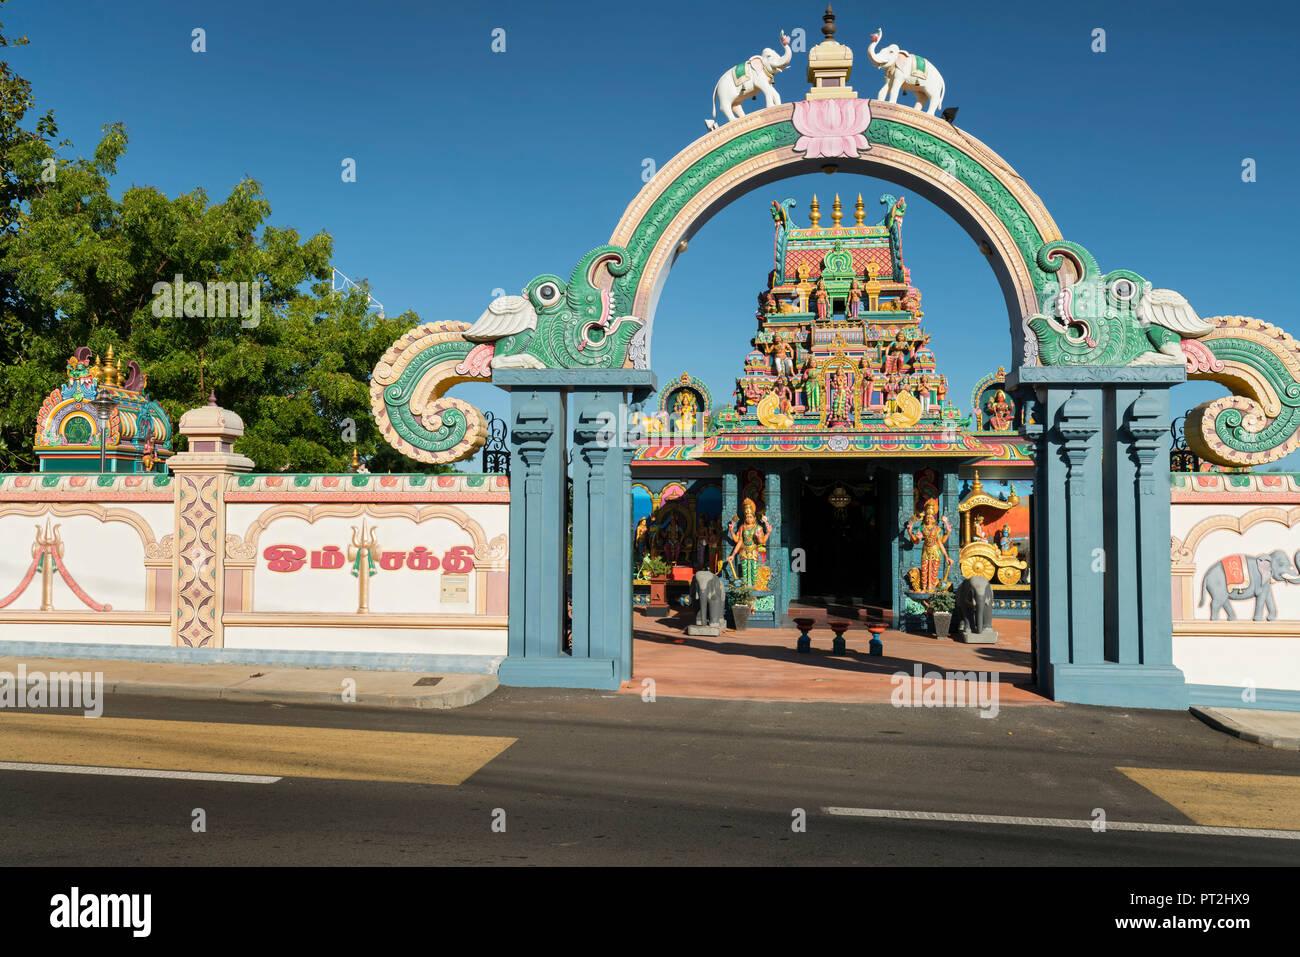 Hindu temple in rue Jaques Prevert, La Possession, Reunion, France - Stock Image